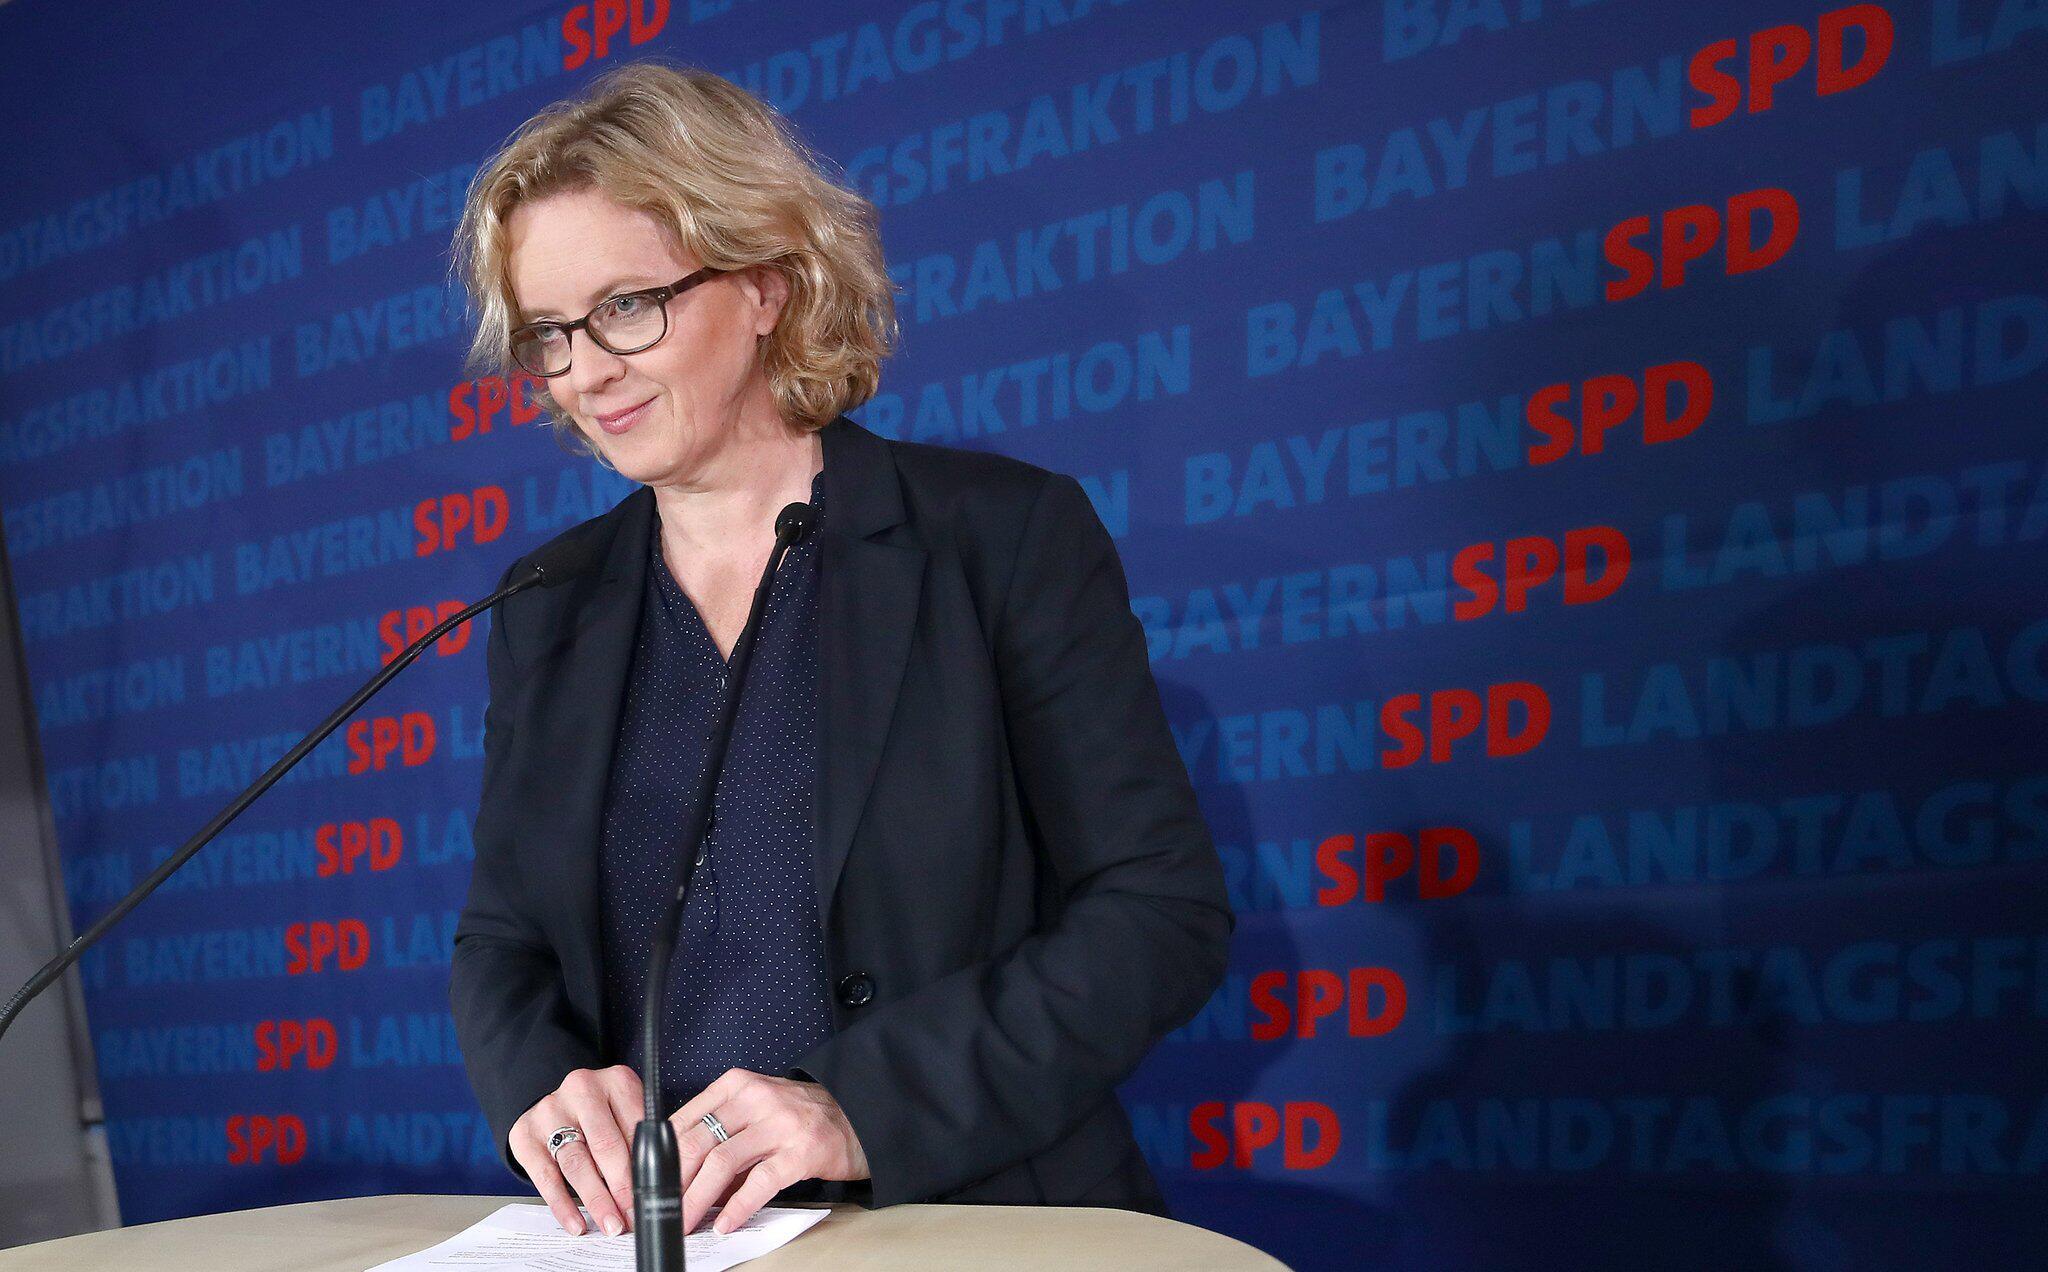 Bild zu Landtagswahl Bayern - Landtag SPD